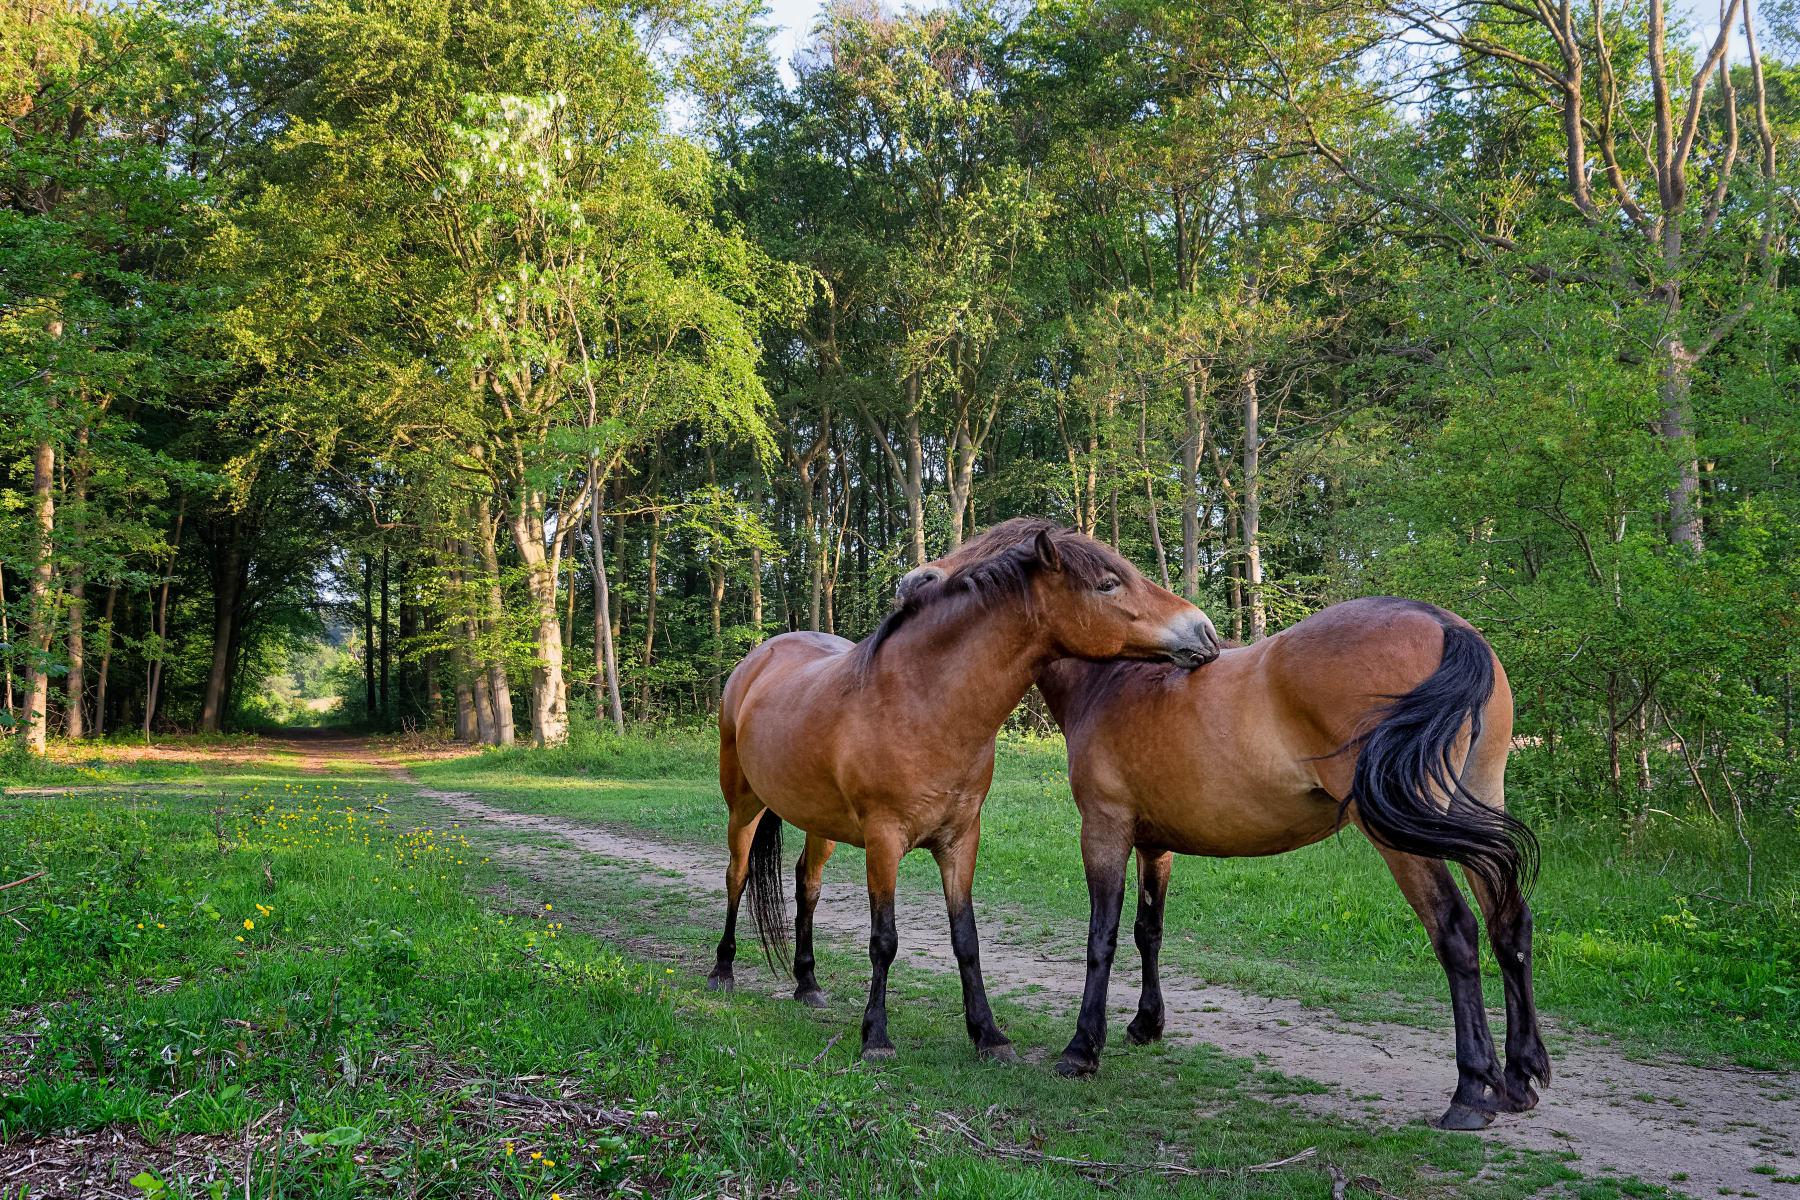 affectionate horses hugging in forest lane